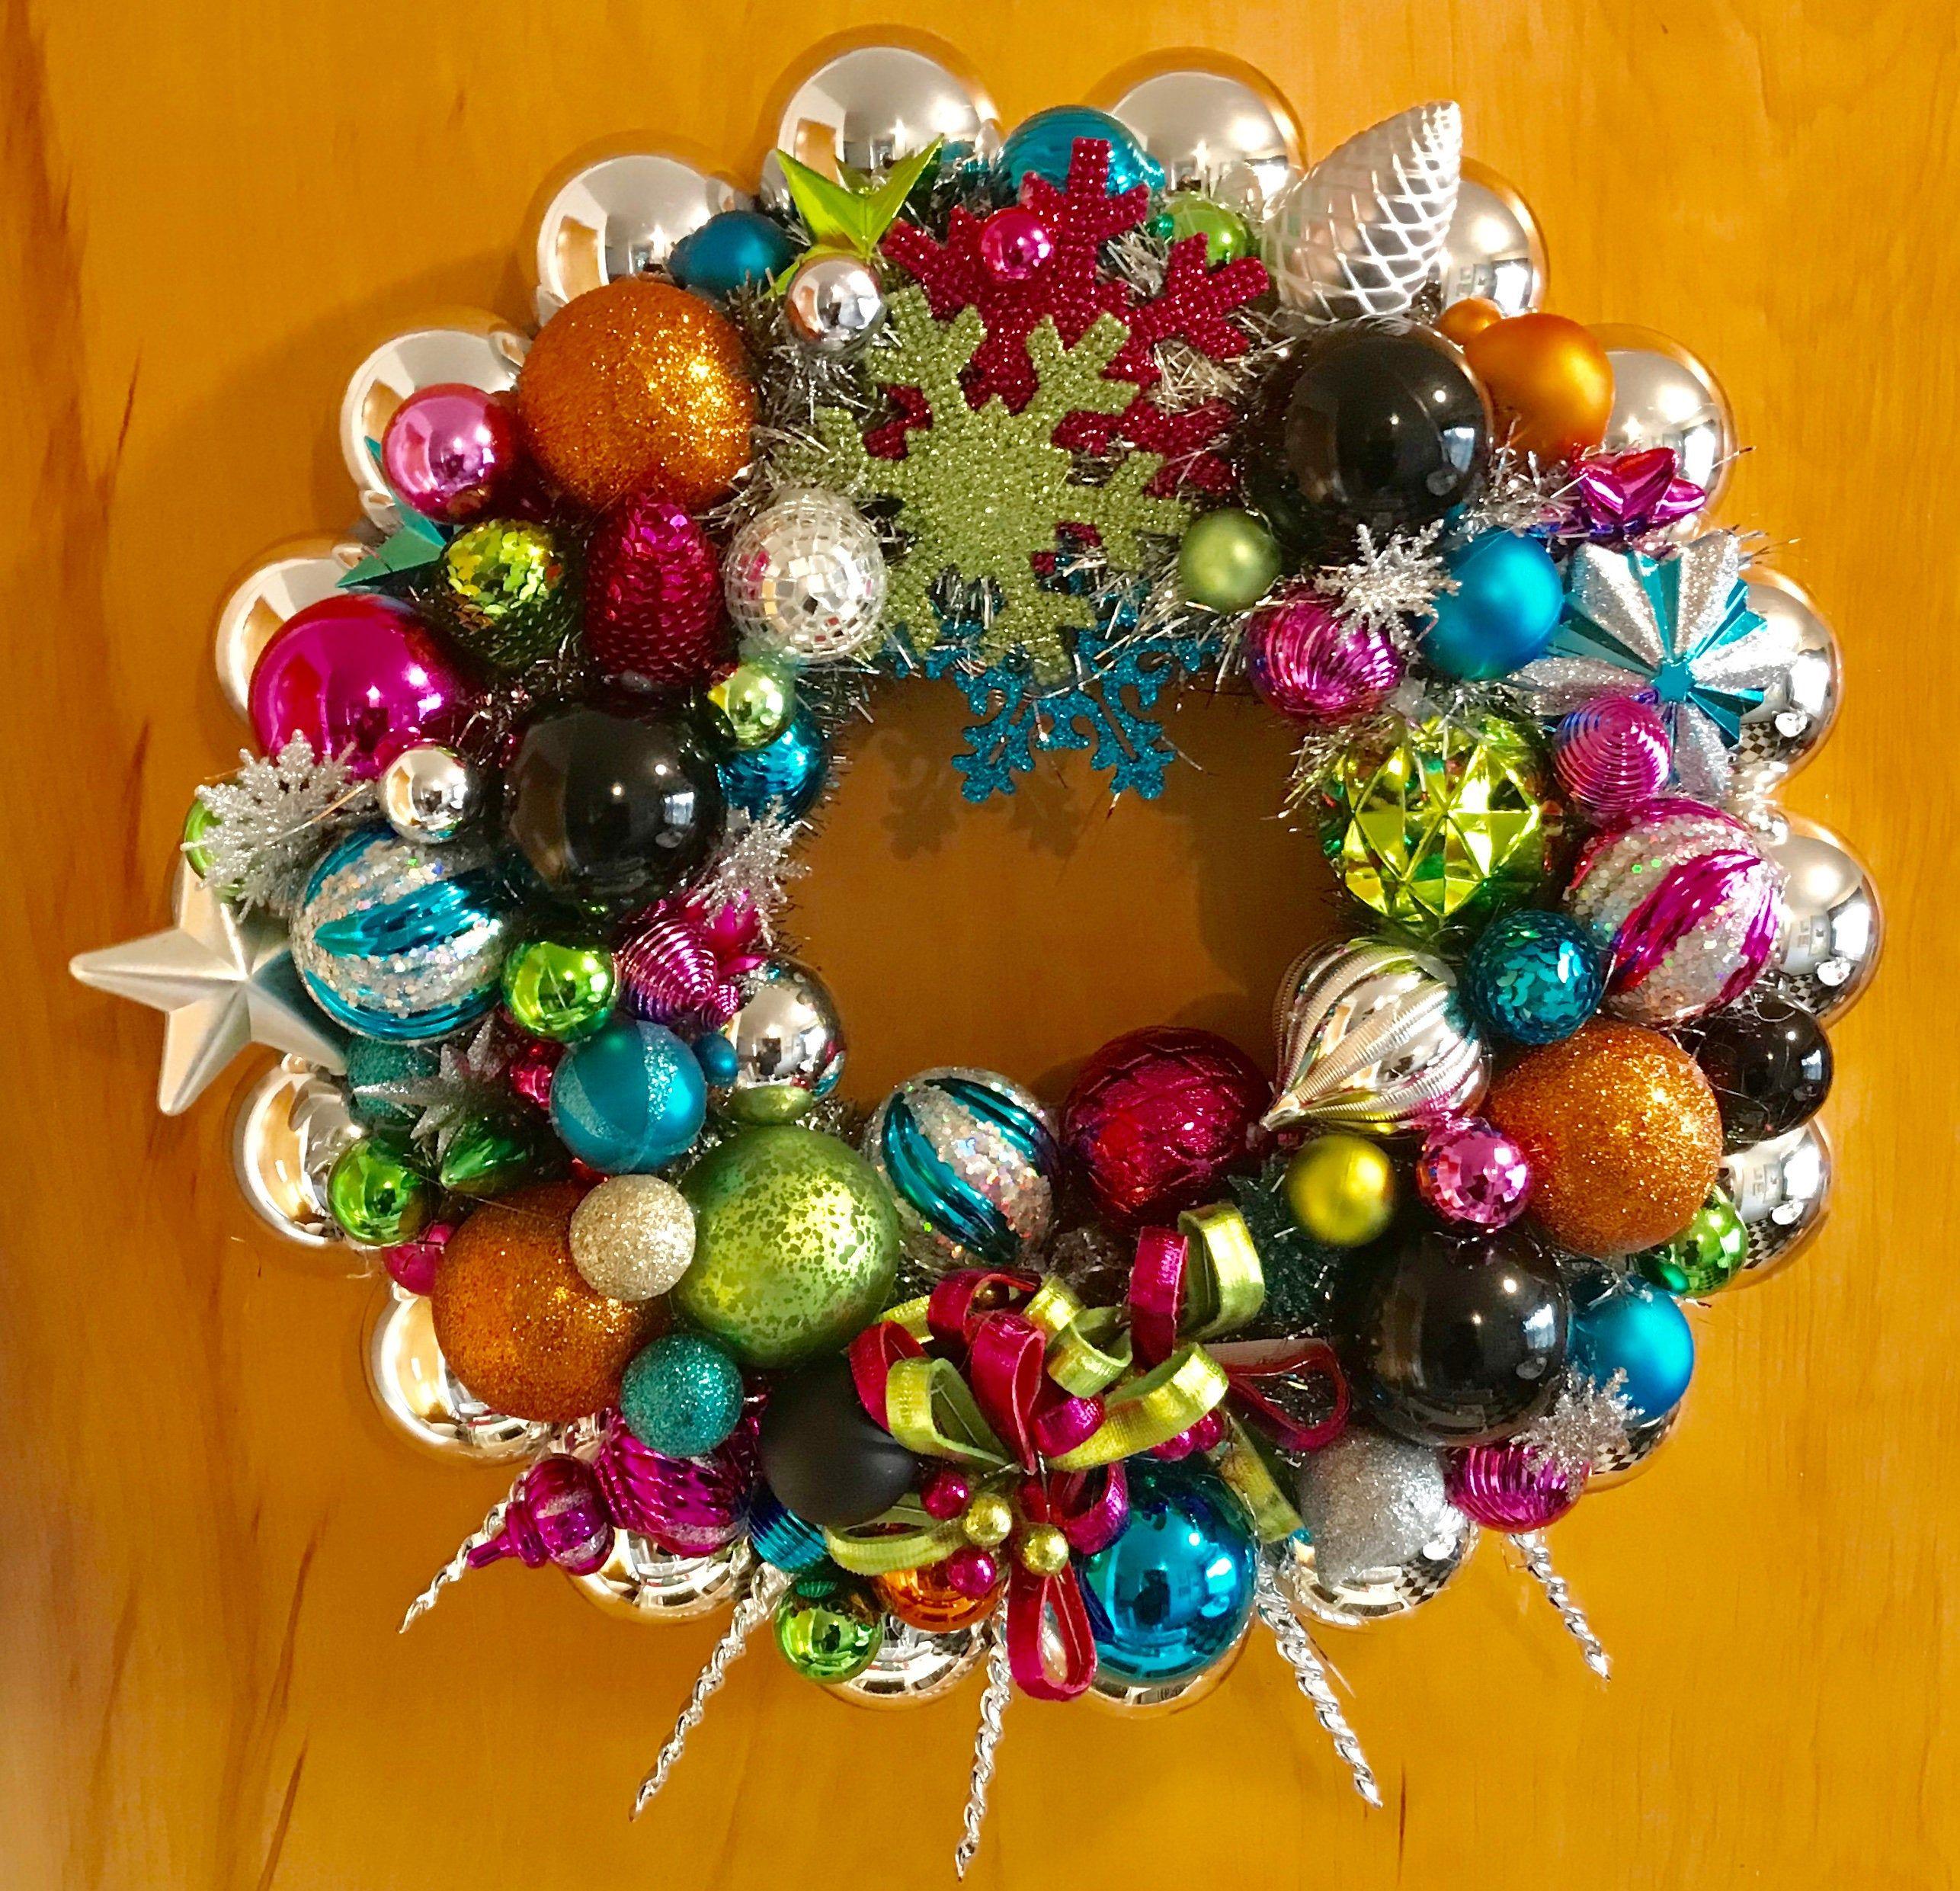 Photo of Christmas ornament wreath.  Mid century modern, Retro, kitschy, VIBRANT, cheerful designer wreath